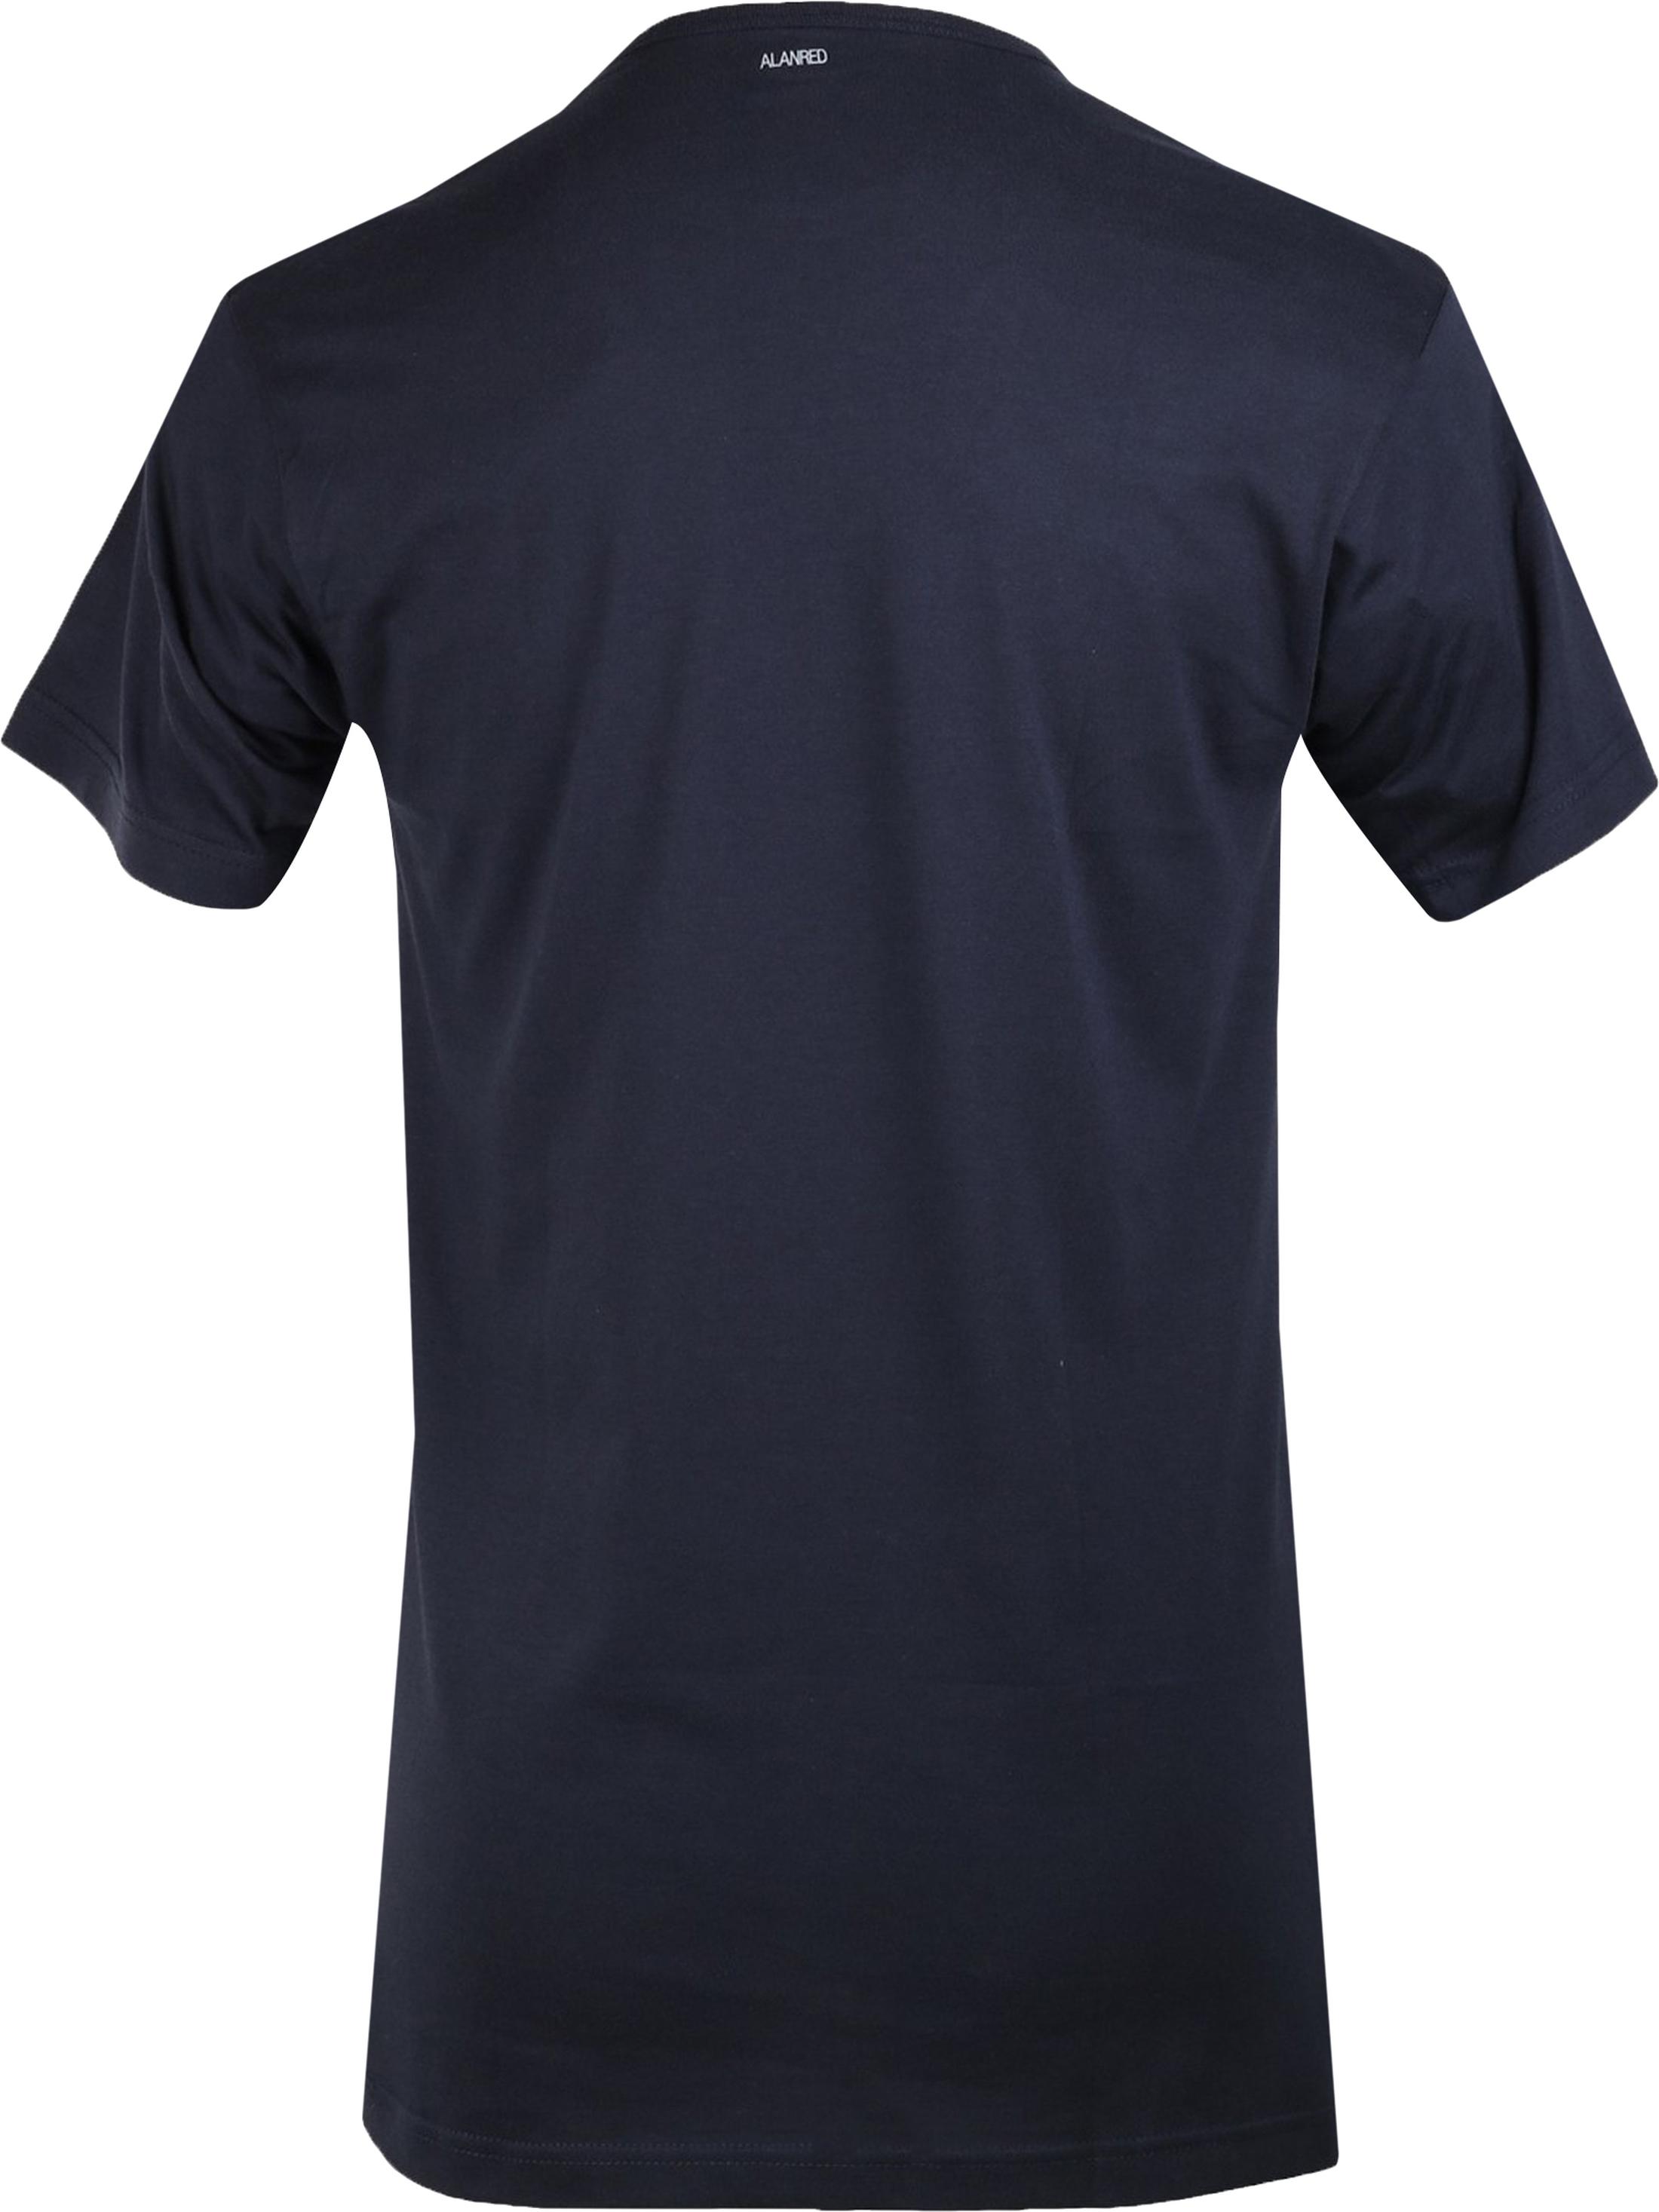 Alan Red Derby O-Neck T-shirt Navy 1-Pack foto 2